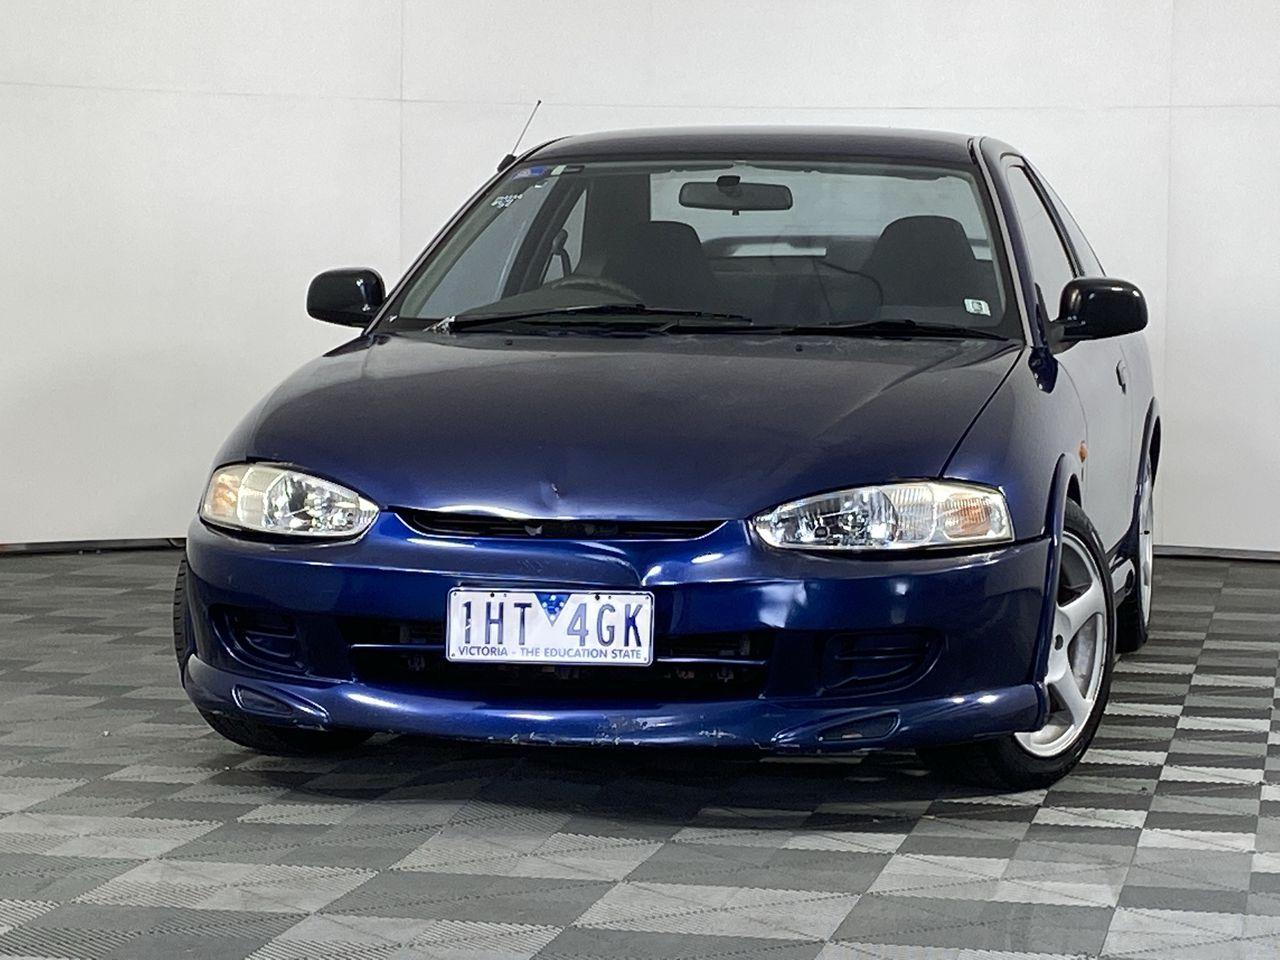 2001 Mitsubishi Lancer GLI CE Manual Coupe